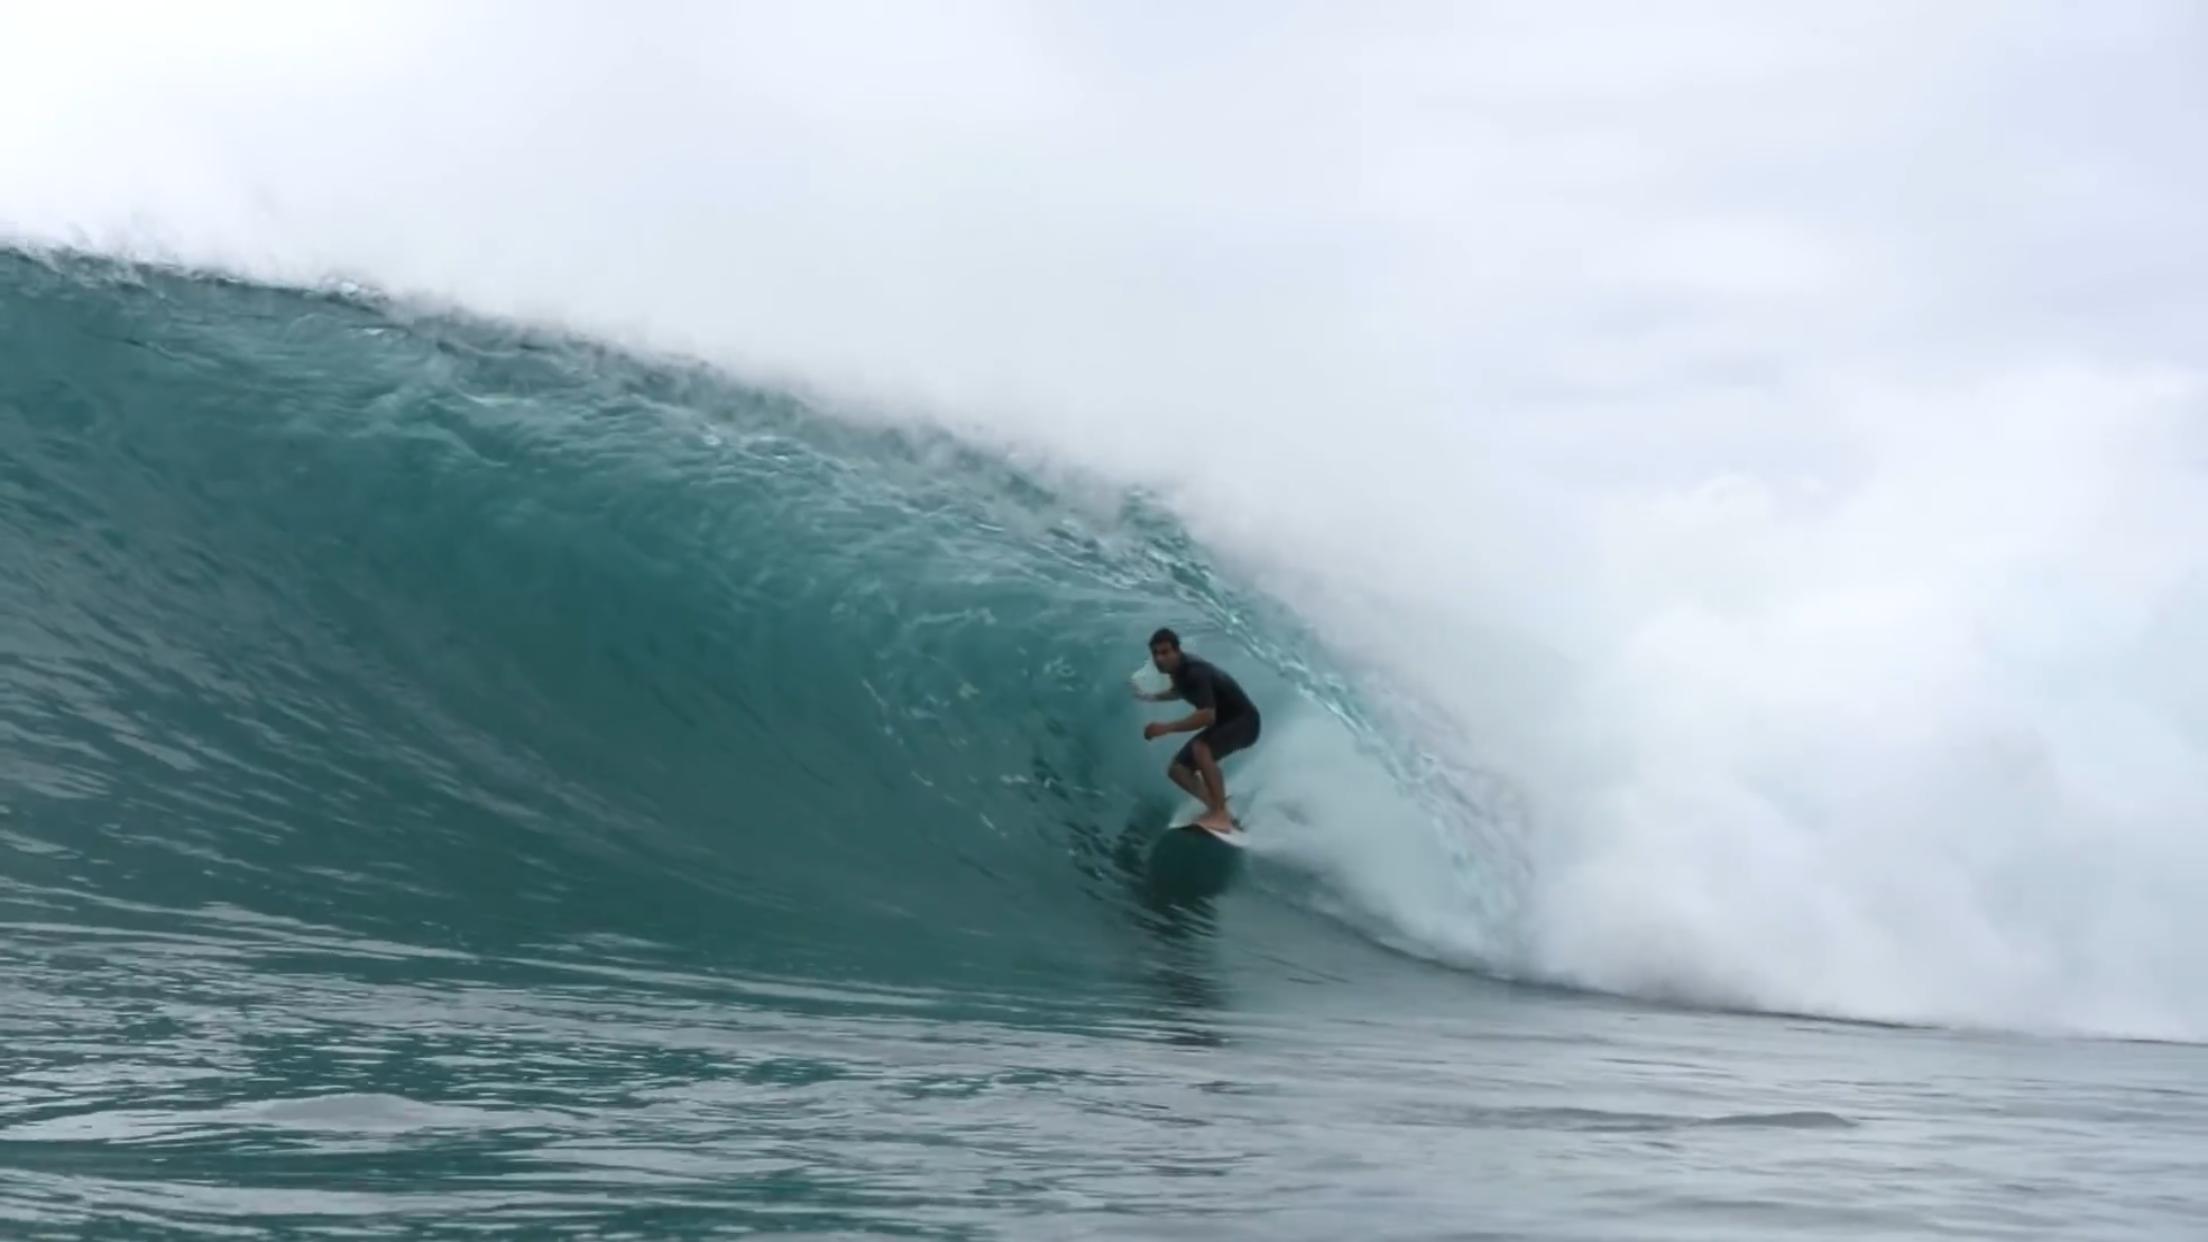 Another Gold Coast, Australia barrel.